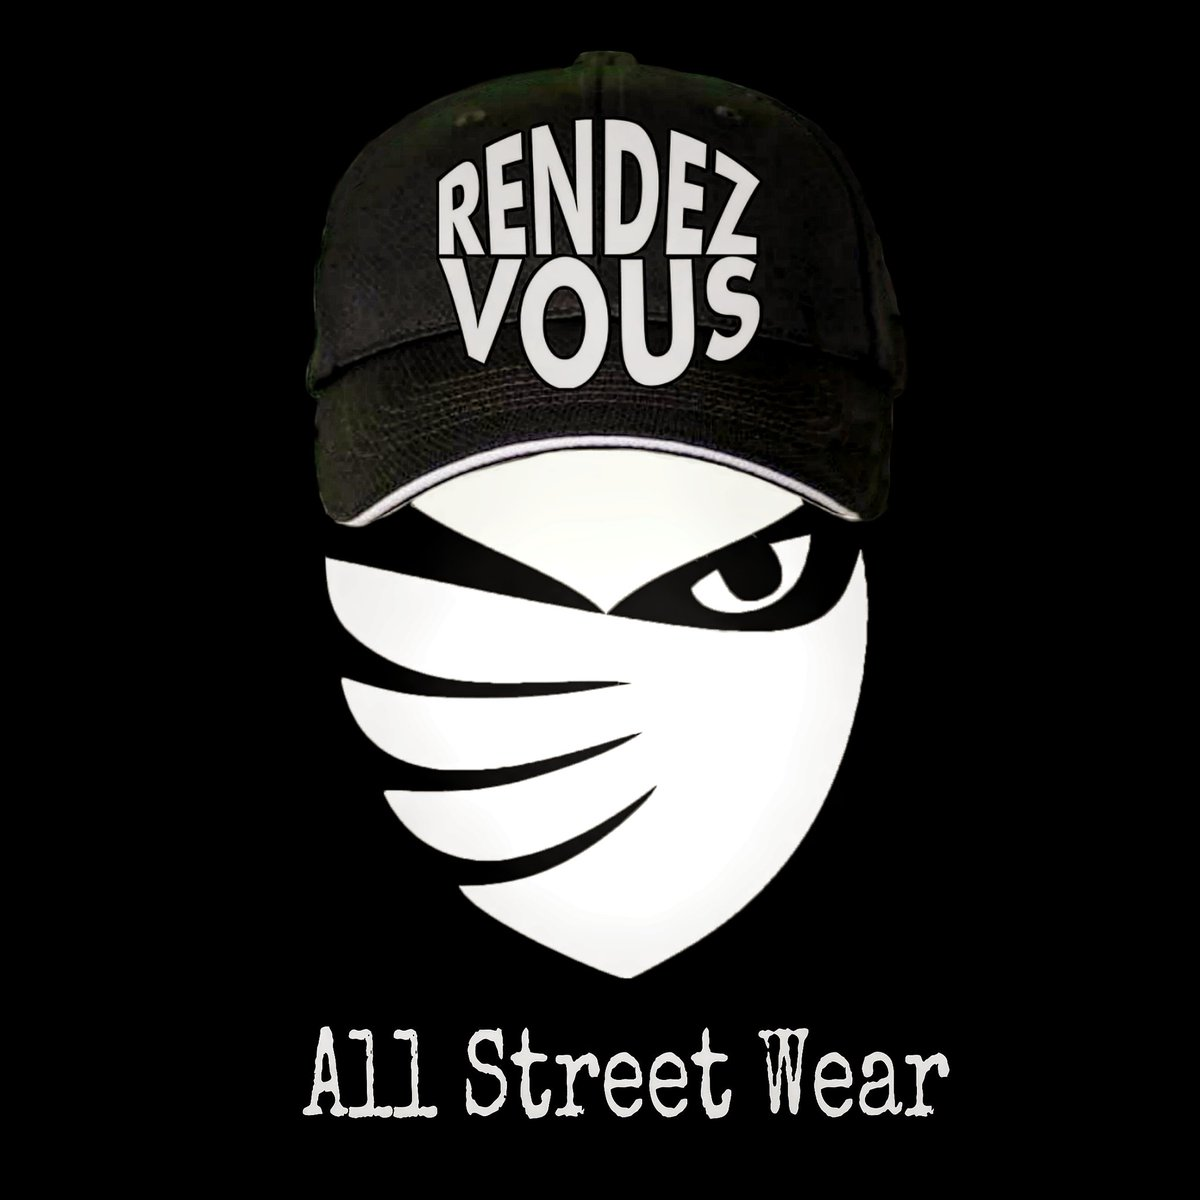 RENDEZVOUS BRAND    All Street Wear @rendezvous_brand  #allstreetwear #streetwear #streetstyle #rendezvous_brand #newyork #london #milano #parís #Barcelona